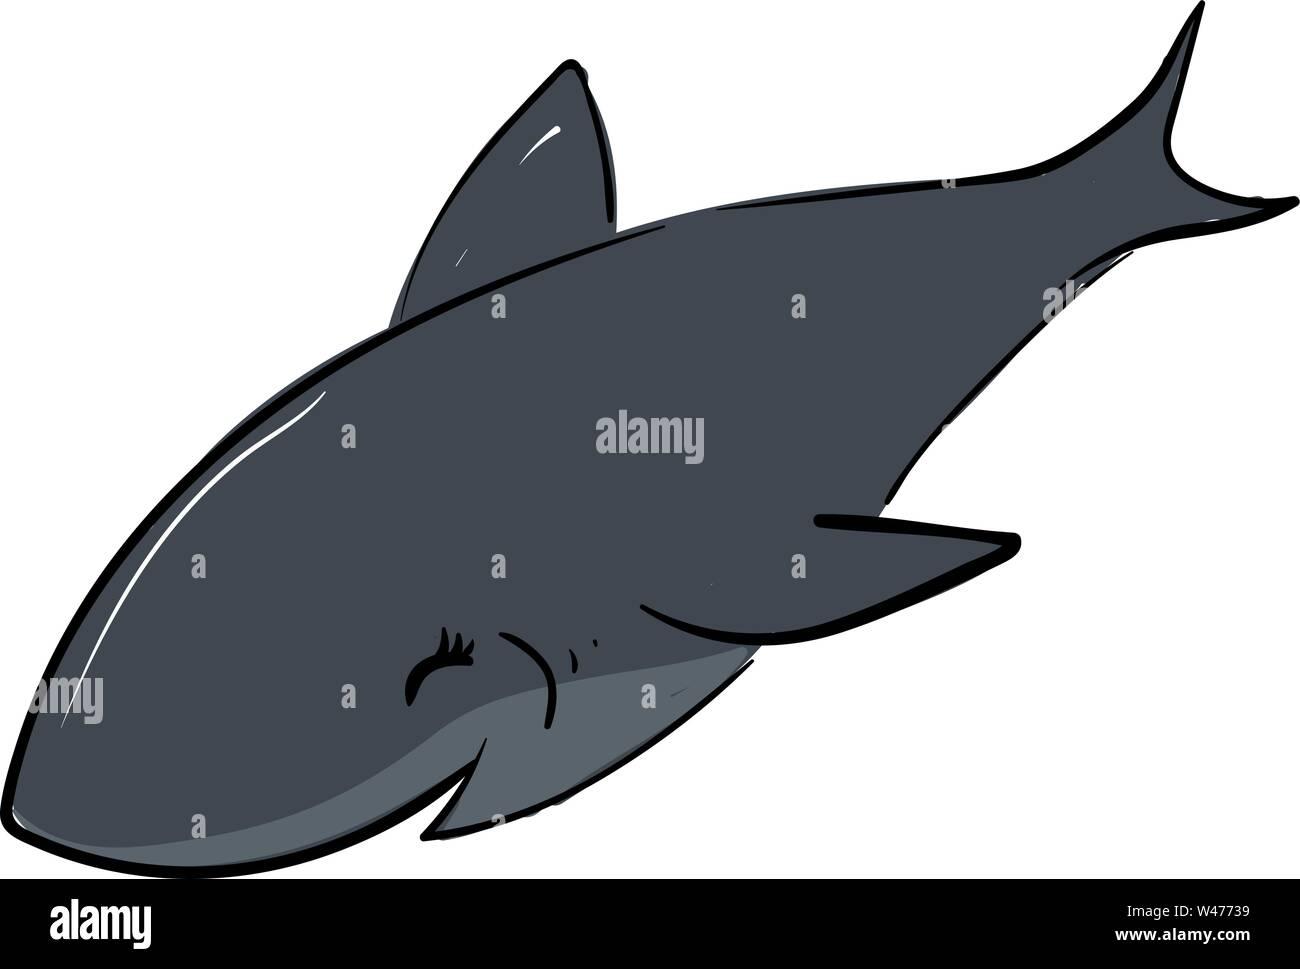 Happy smiling shark, illustration, vector on white background. - Stock Image